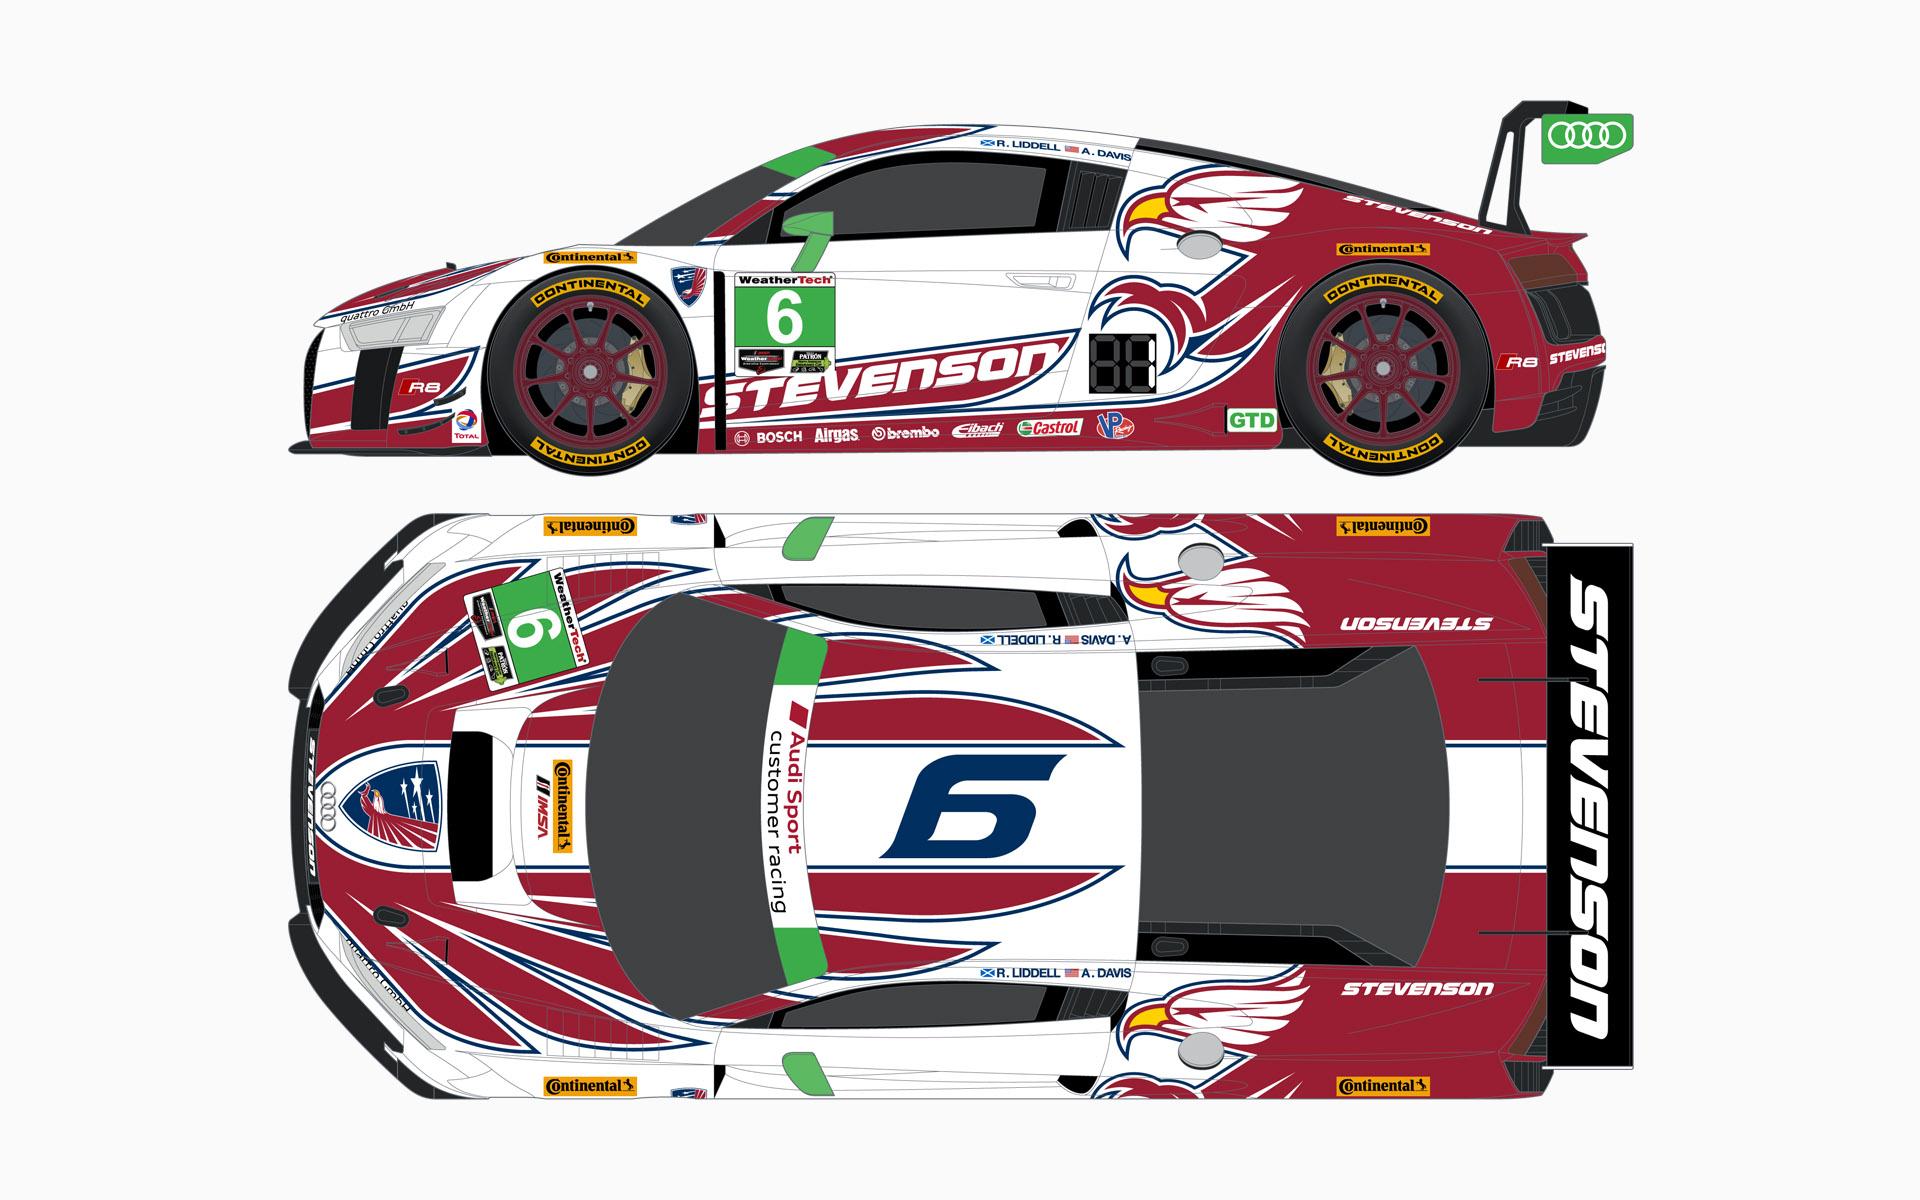 2016 Stevenson Motorsports Audi R8 LMS GT3 Livery Elevations